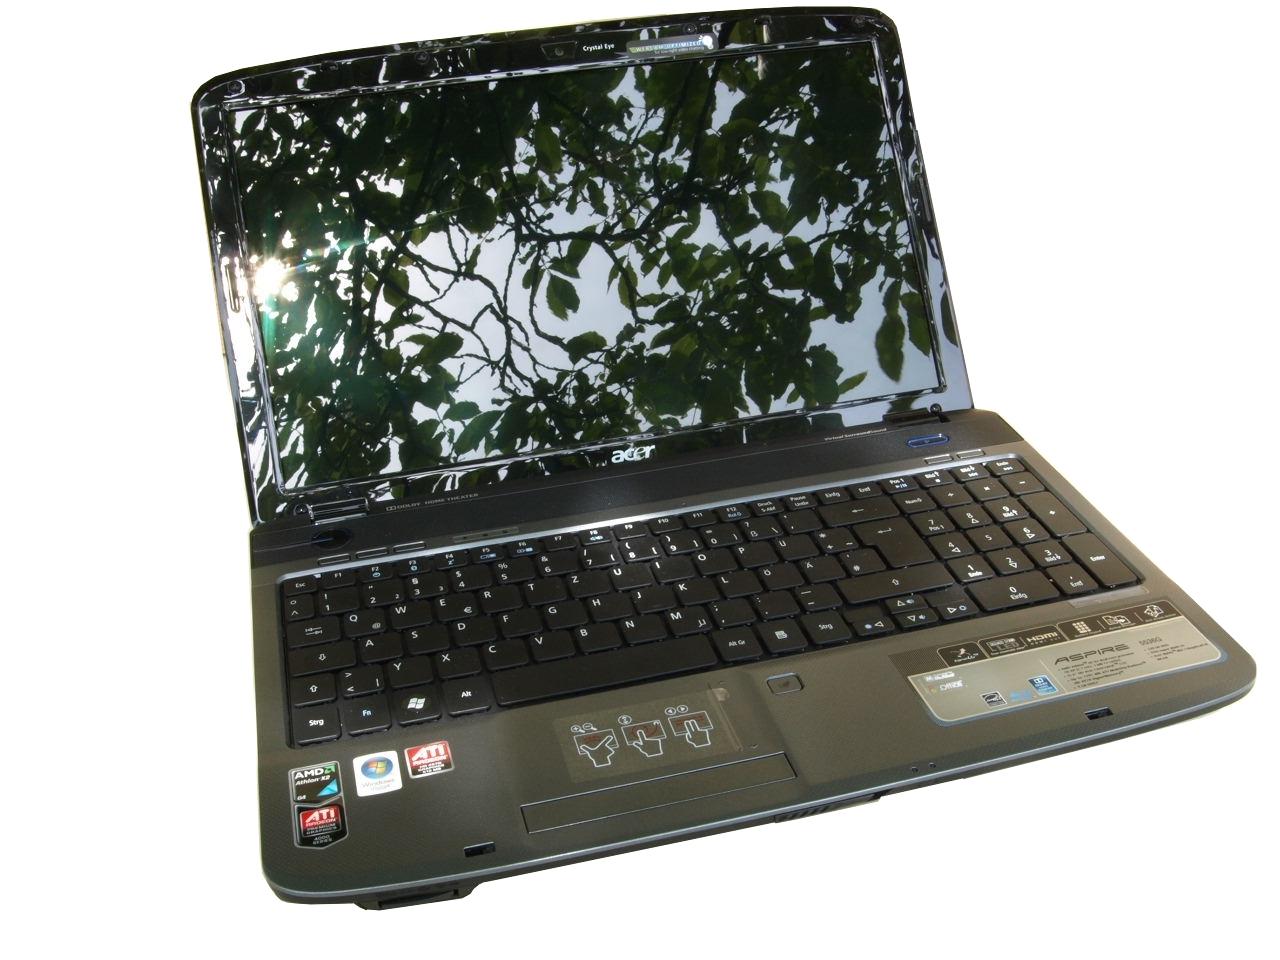 Download Drivers: Acer Aspire 5542 Notebook Realtek Audio